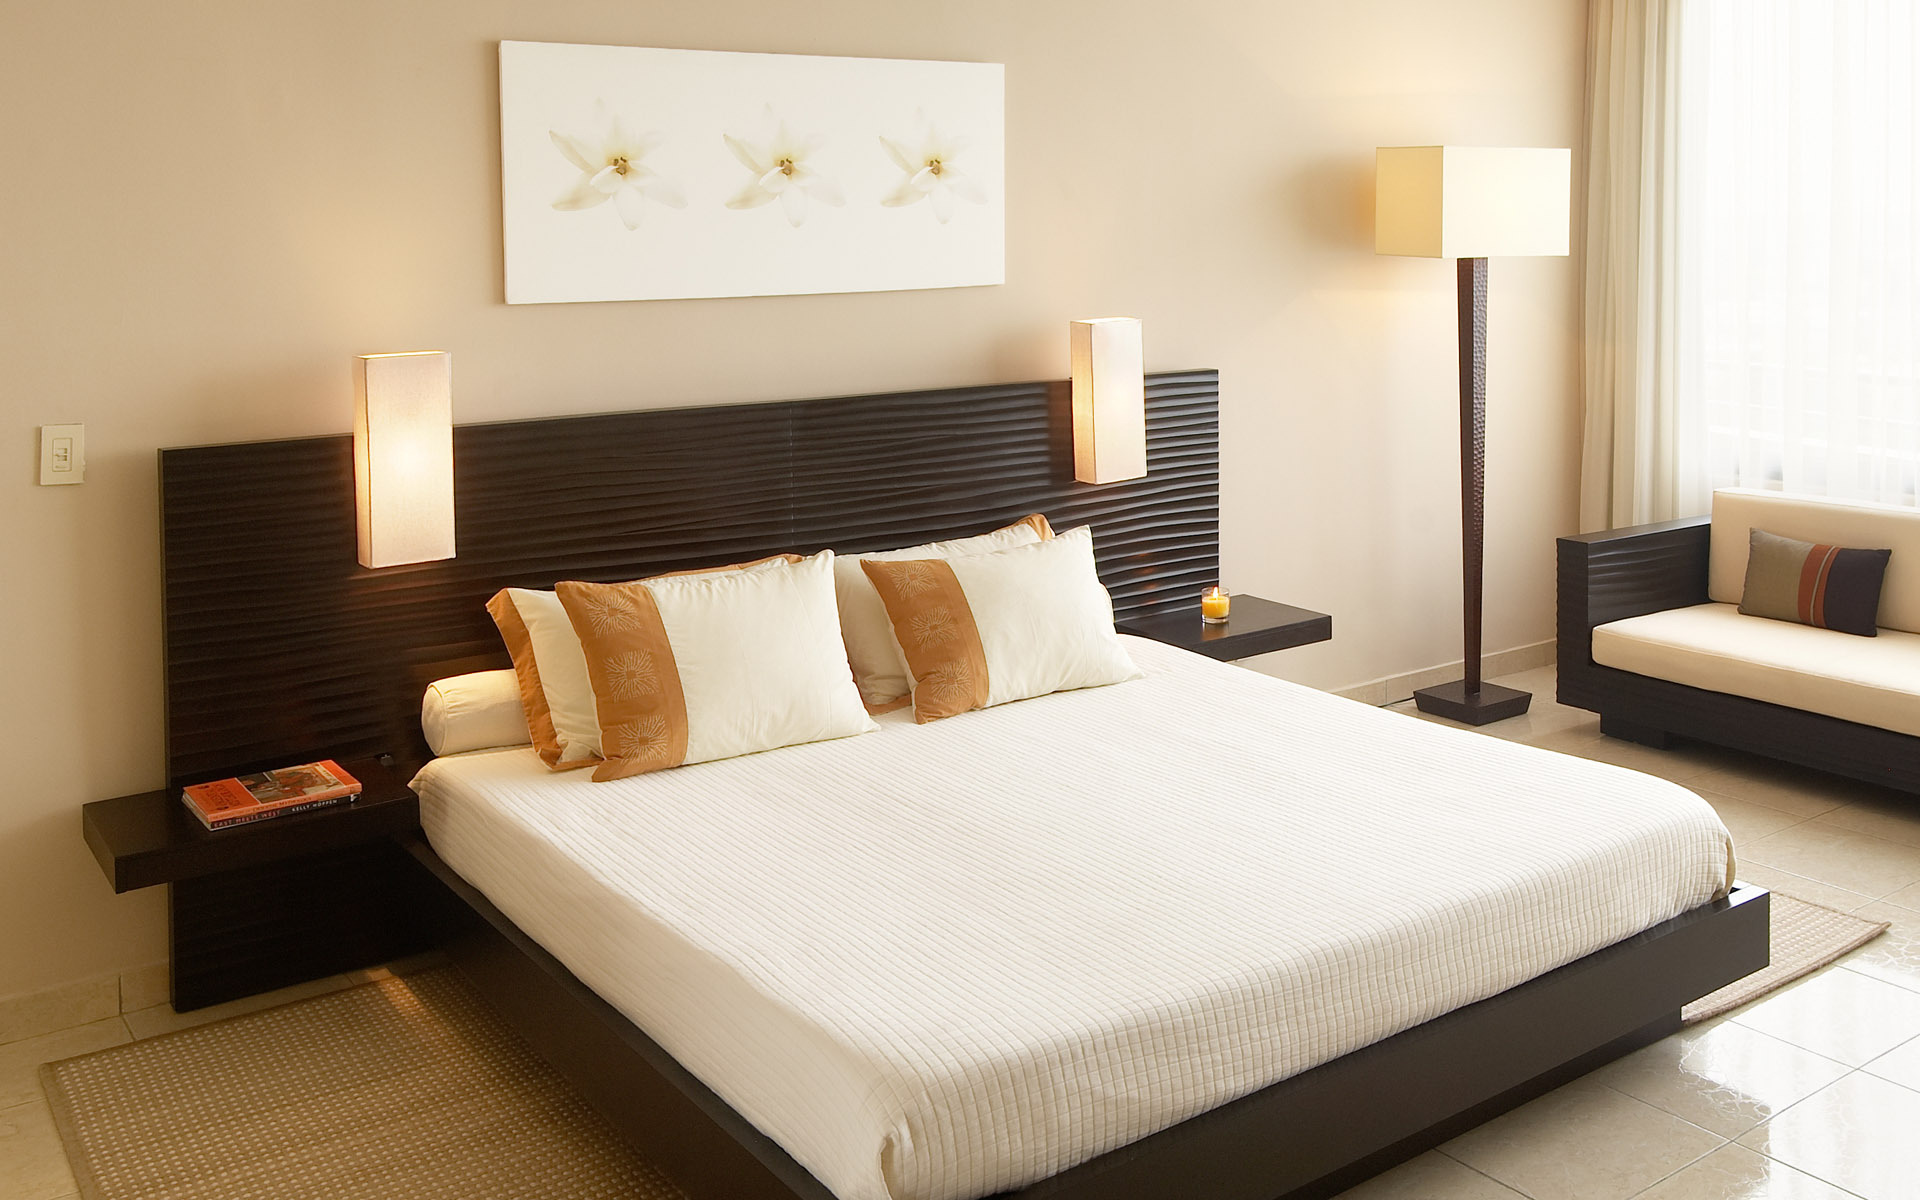 Интерьер спальни без мебели фото